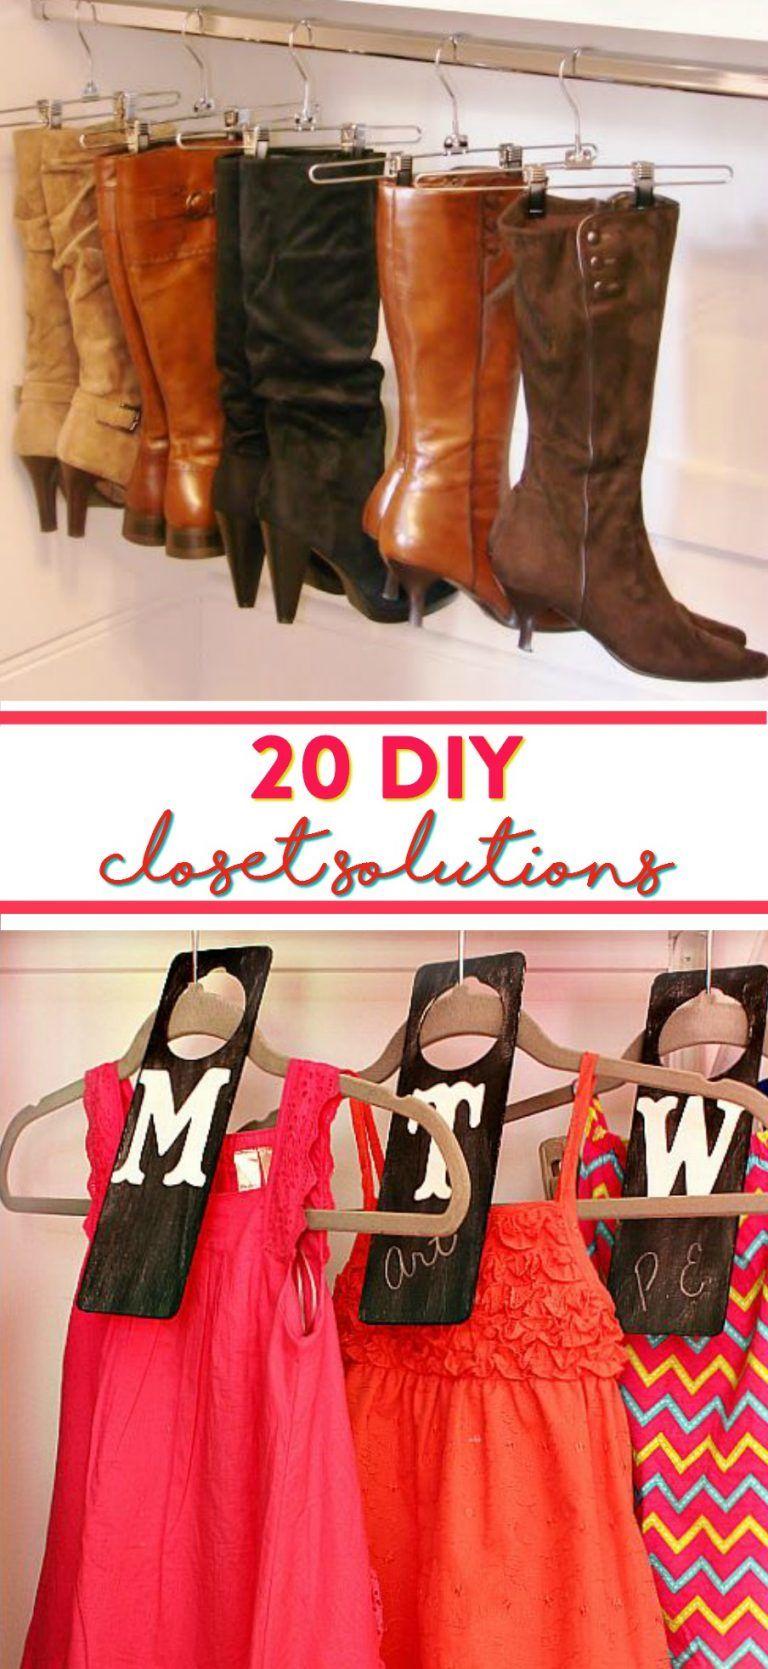 20 DIY Closet Solutions (With images) | No closet ...